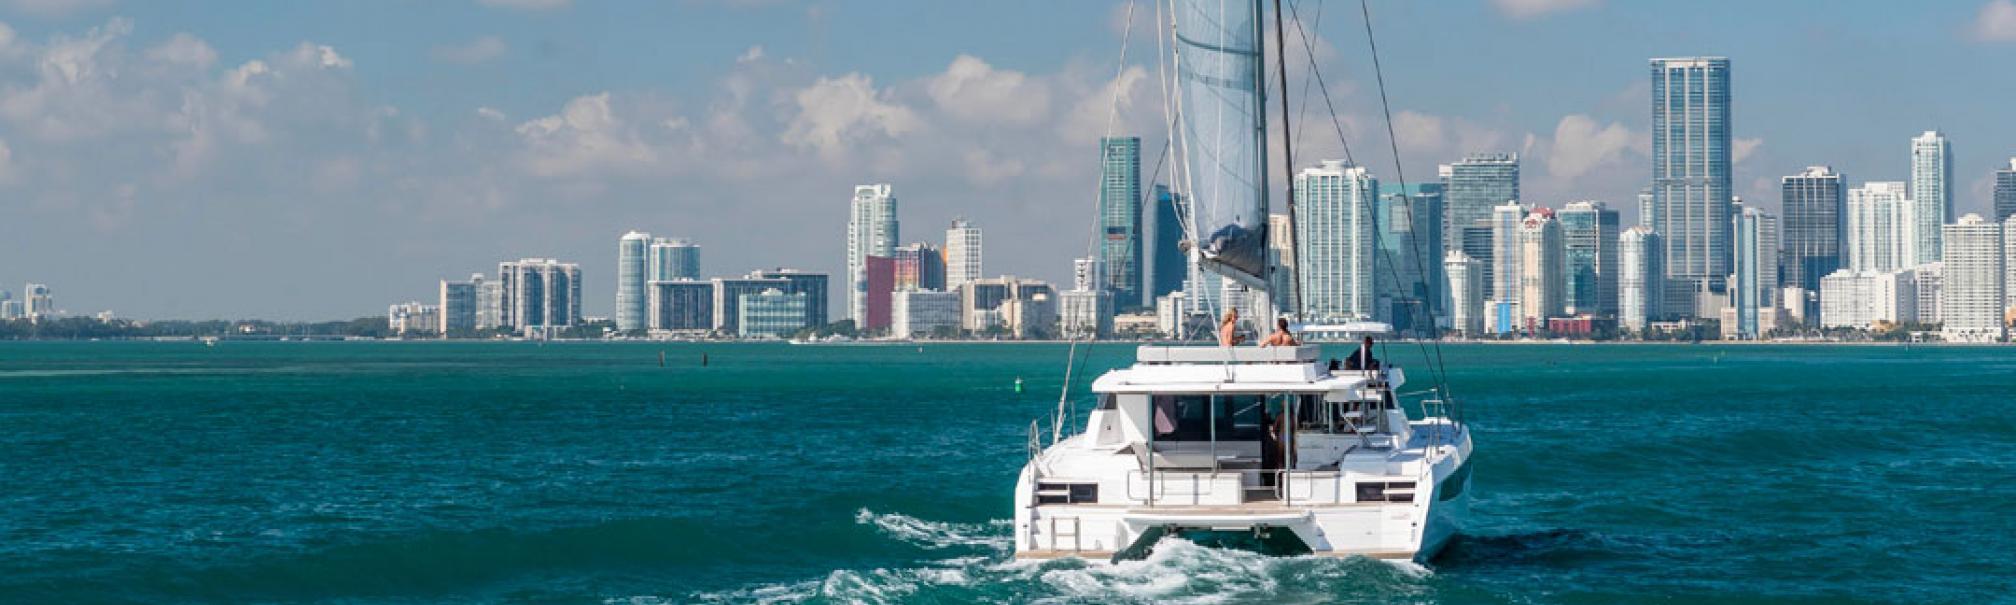 Miami Boat Show Leopard Catamarans